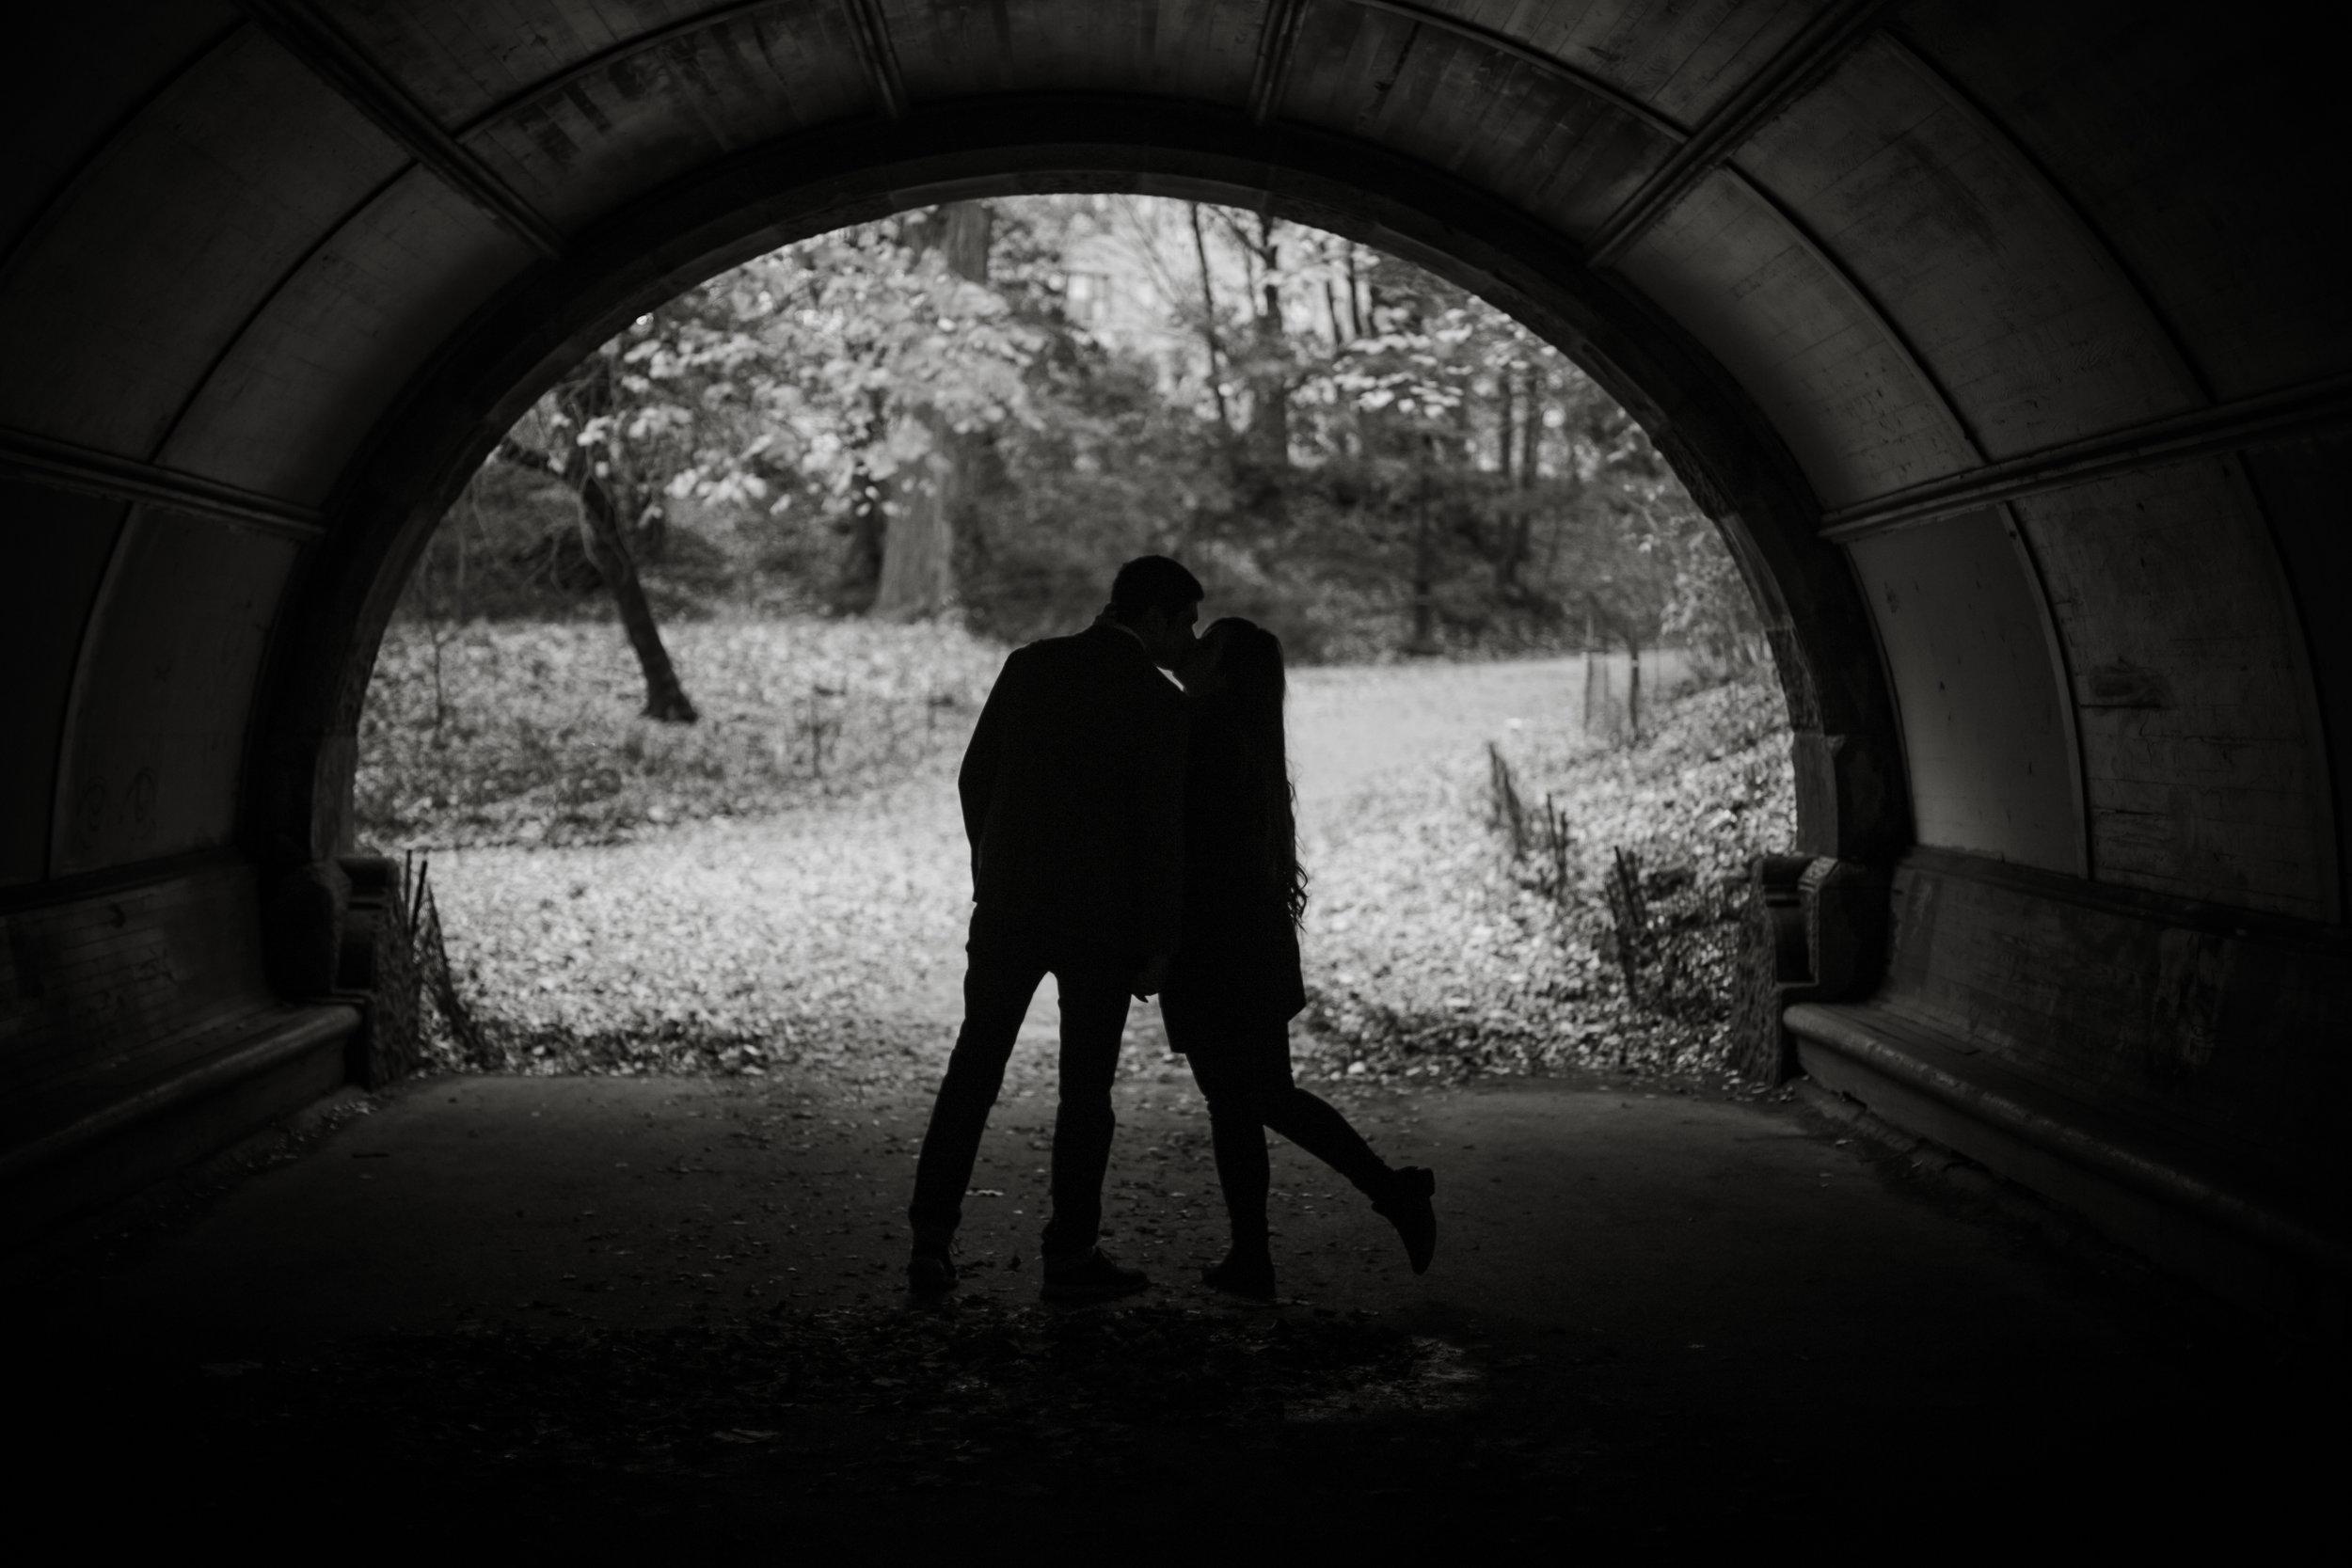 Kate-Alison-Photography-Prospect-Park-Brooklyn-Engagement-Session-Jenna-James-101.jpg